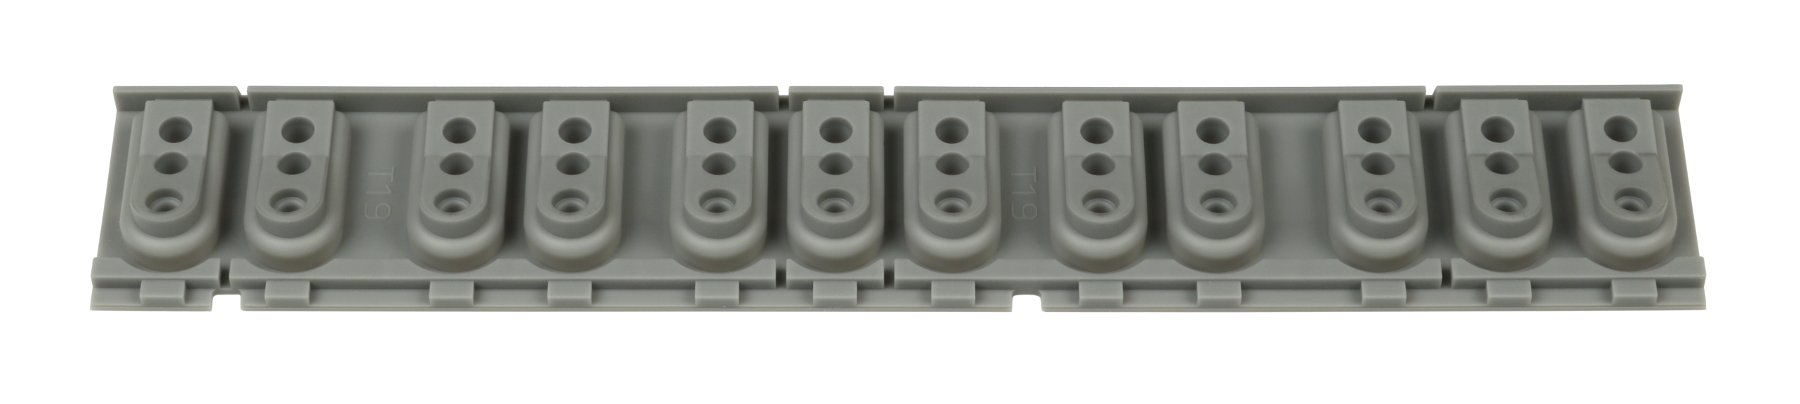 Yamaha V8286601 12-Key Rubber Contact for CLP-170 V8286601